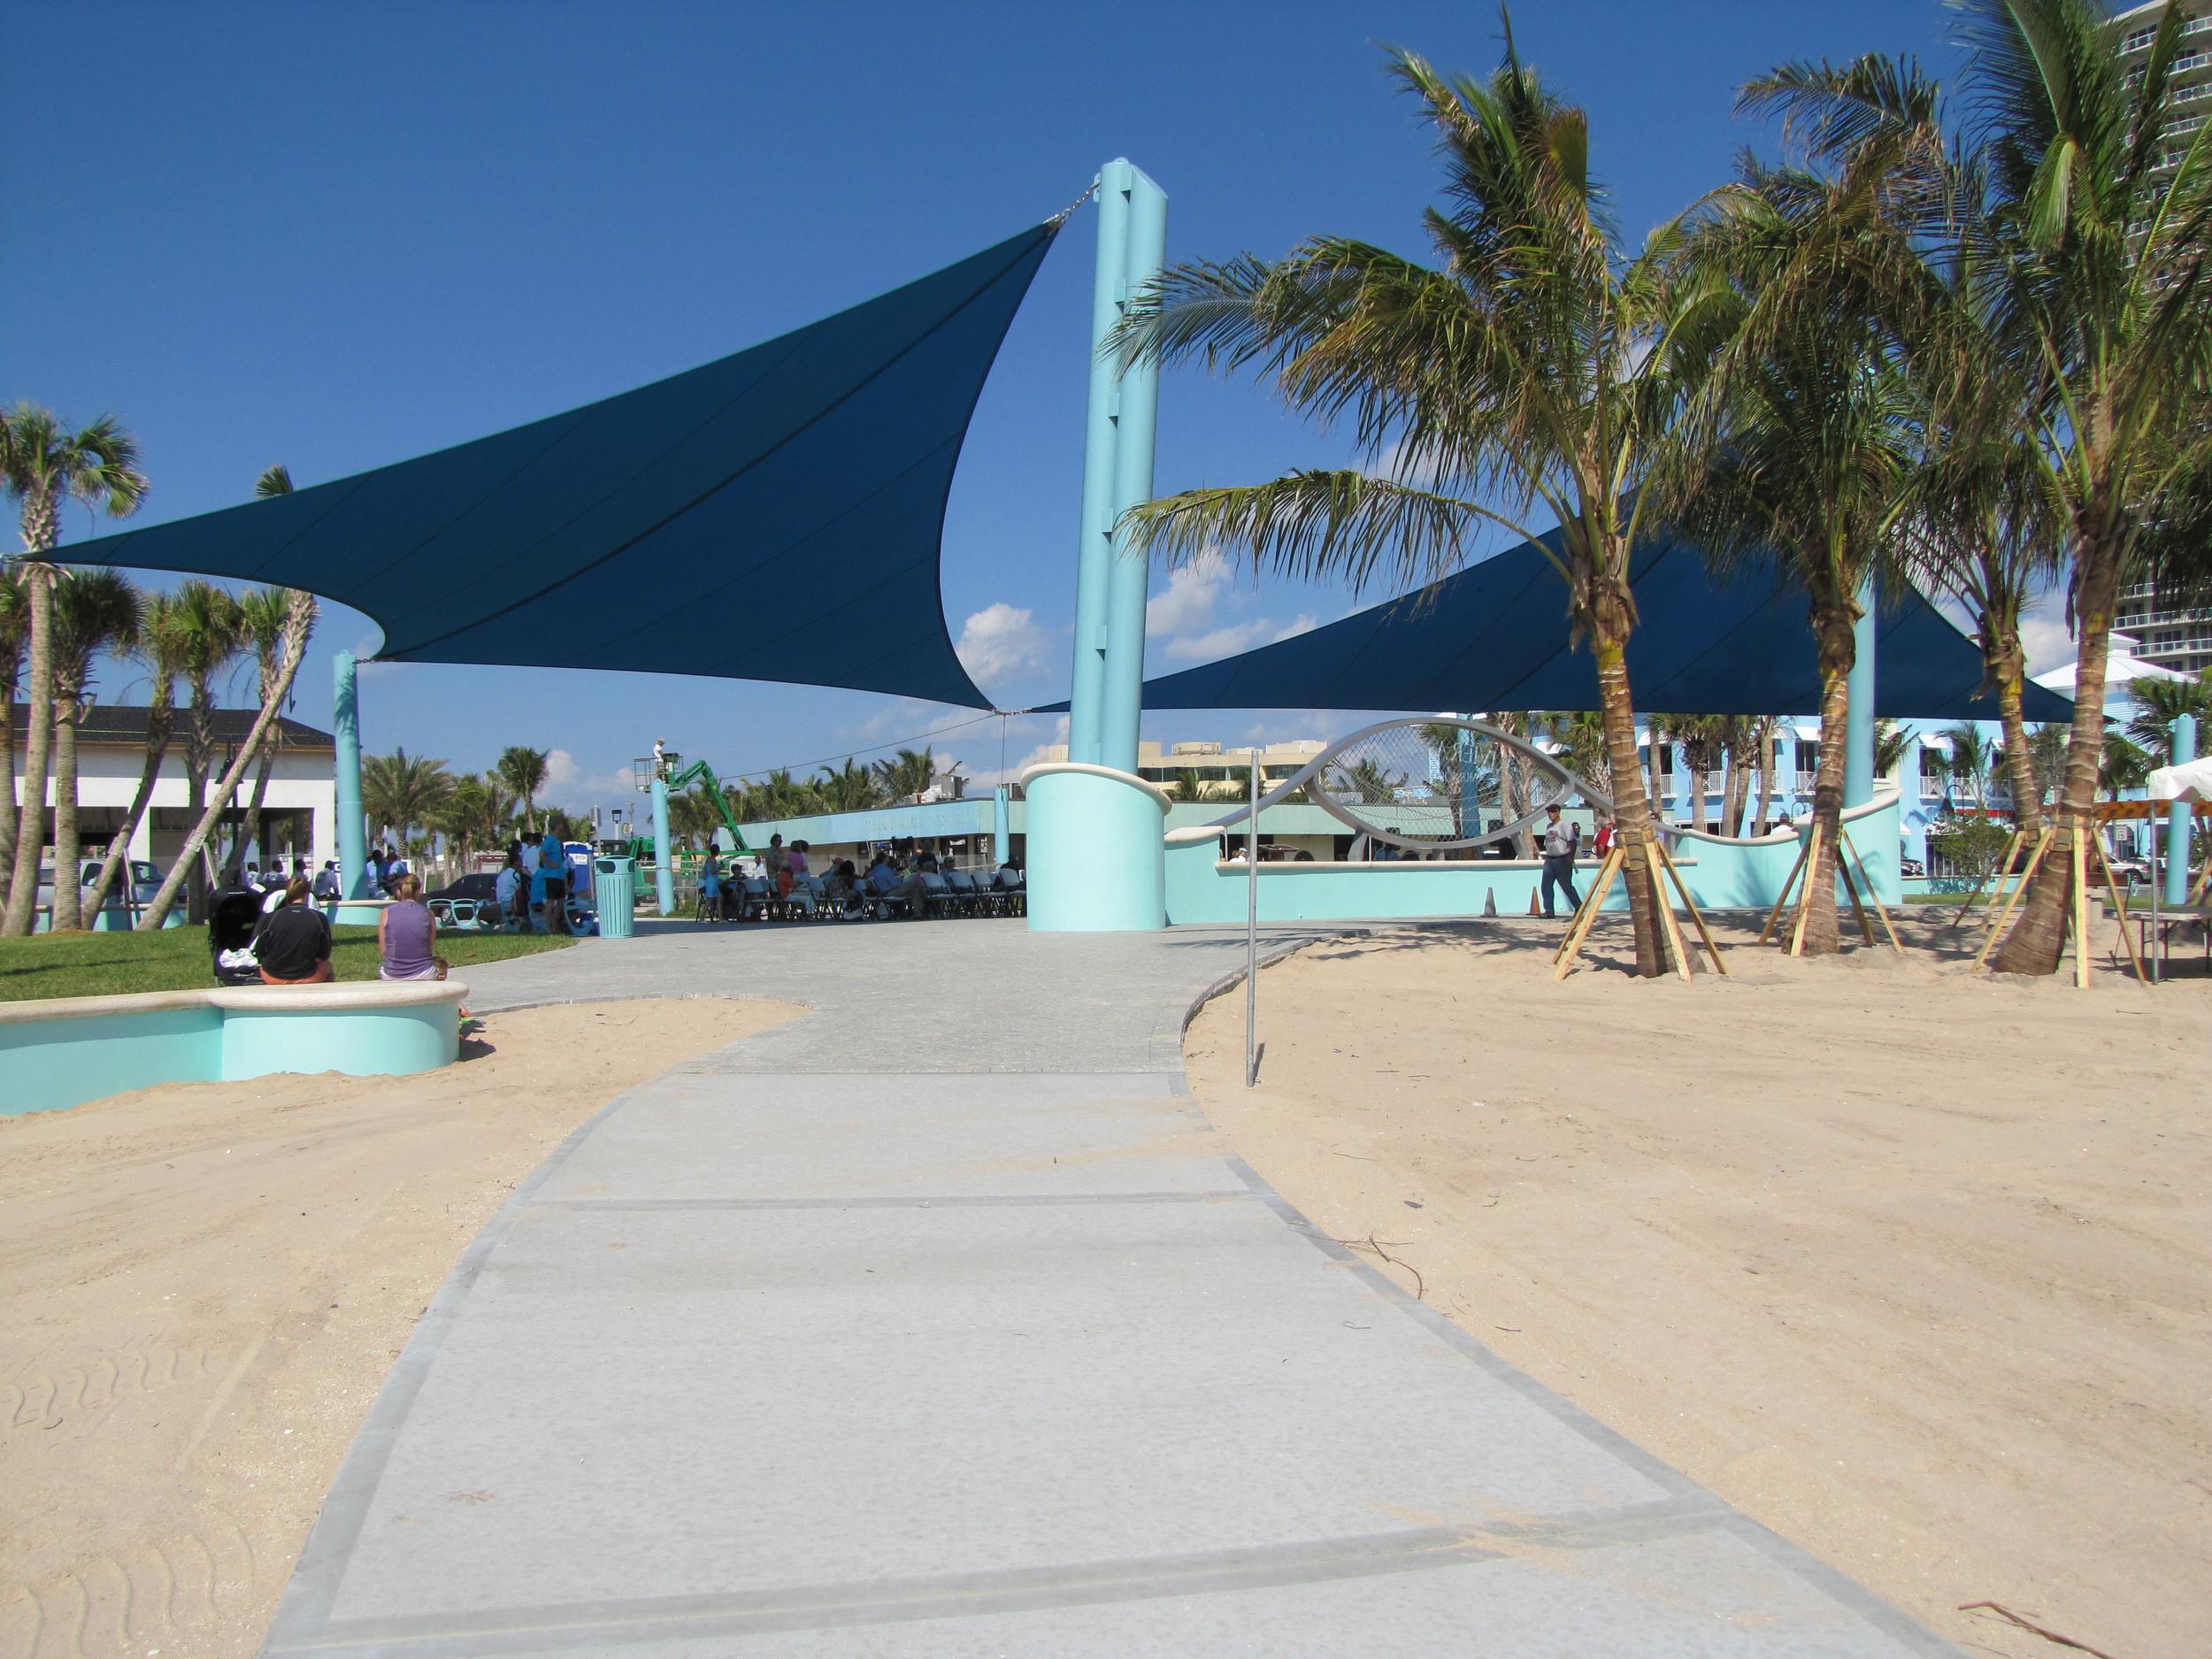 City of Riviera Beach Municipal Beach Park Ocean Mall Shade Sail Entry Opening.jpg